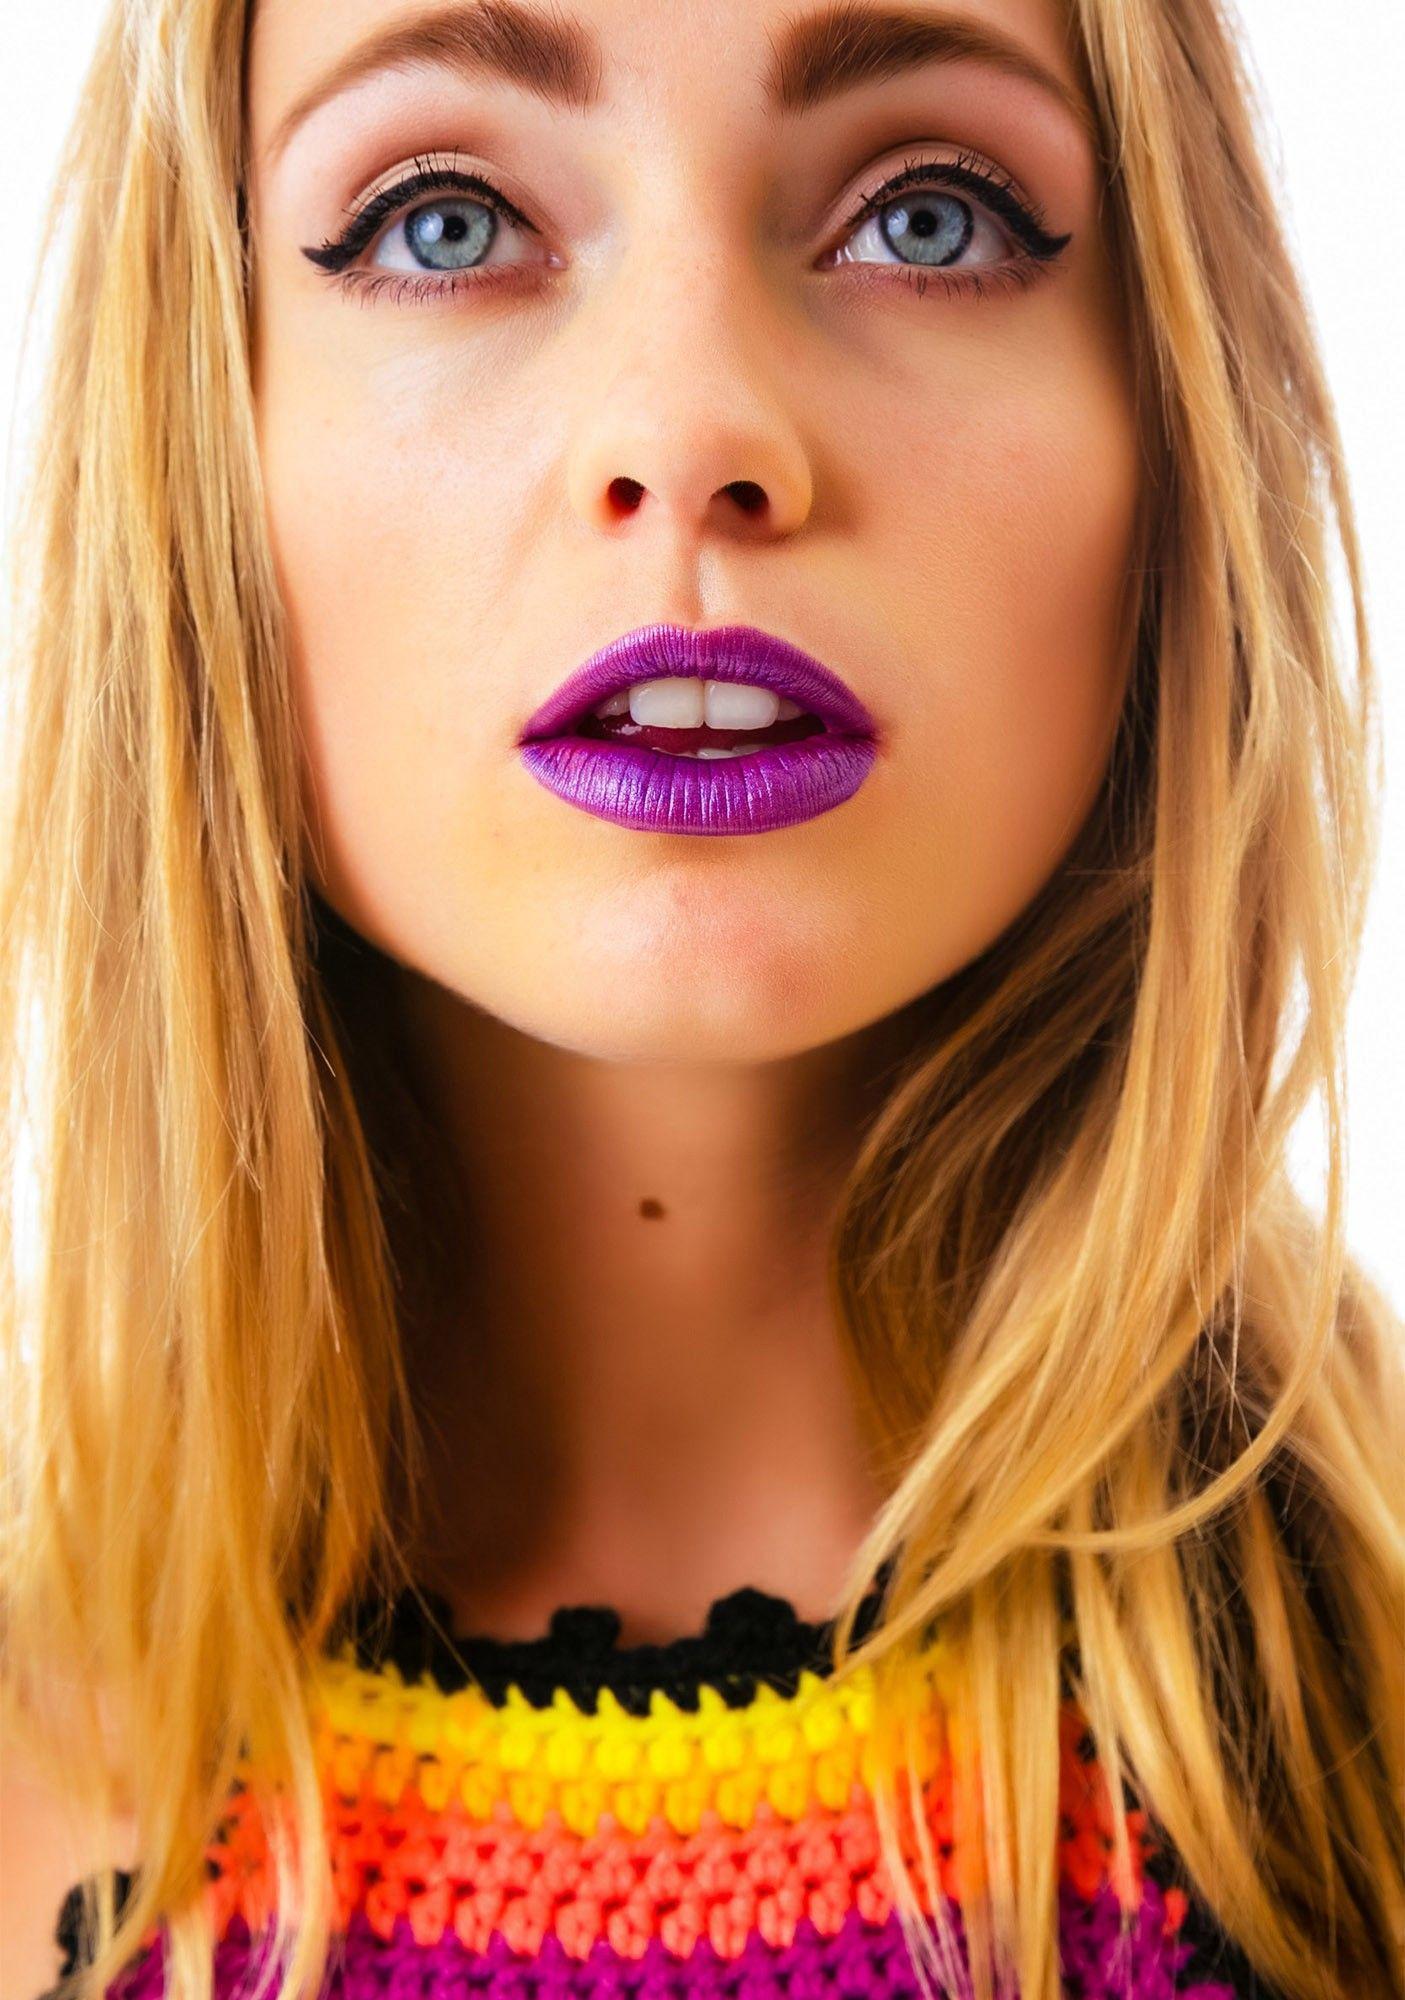 Runway Beauty: Cat Eyes at Dior Fall 2016 Couture - Makeup